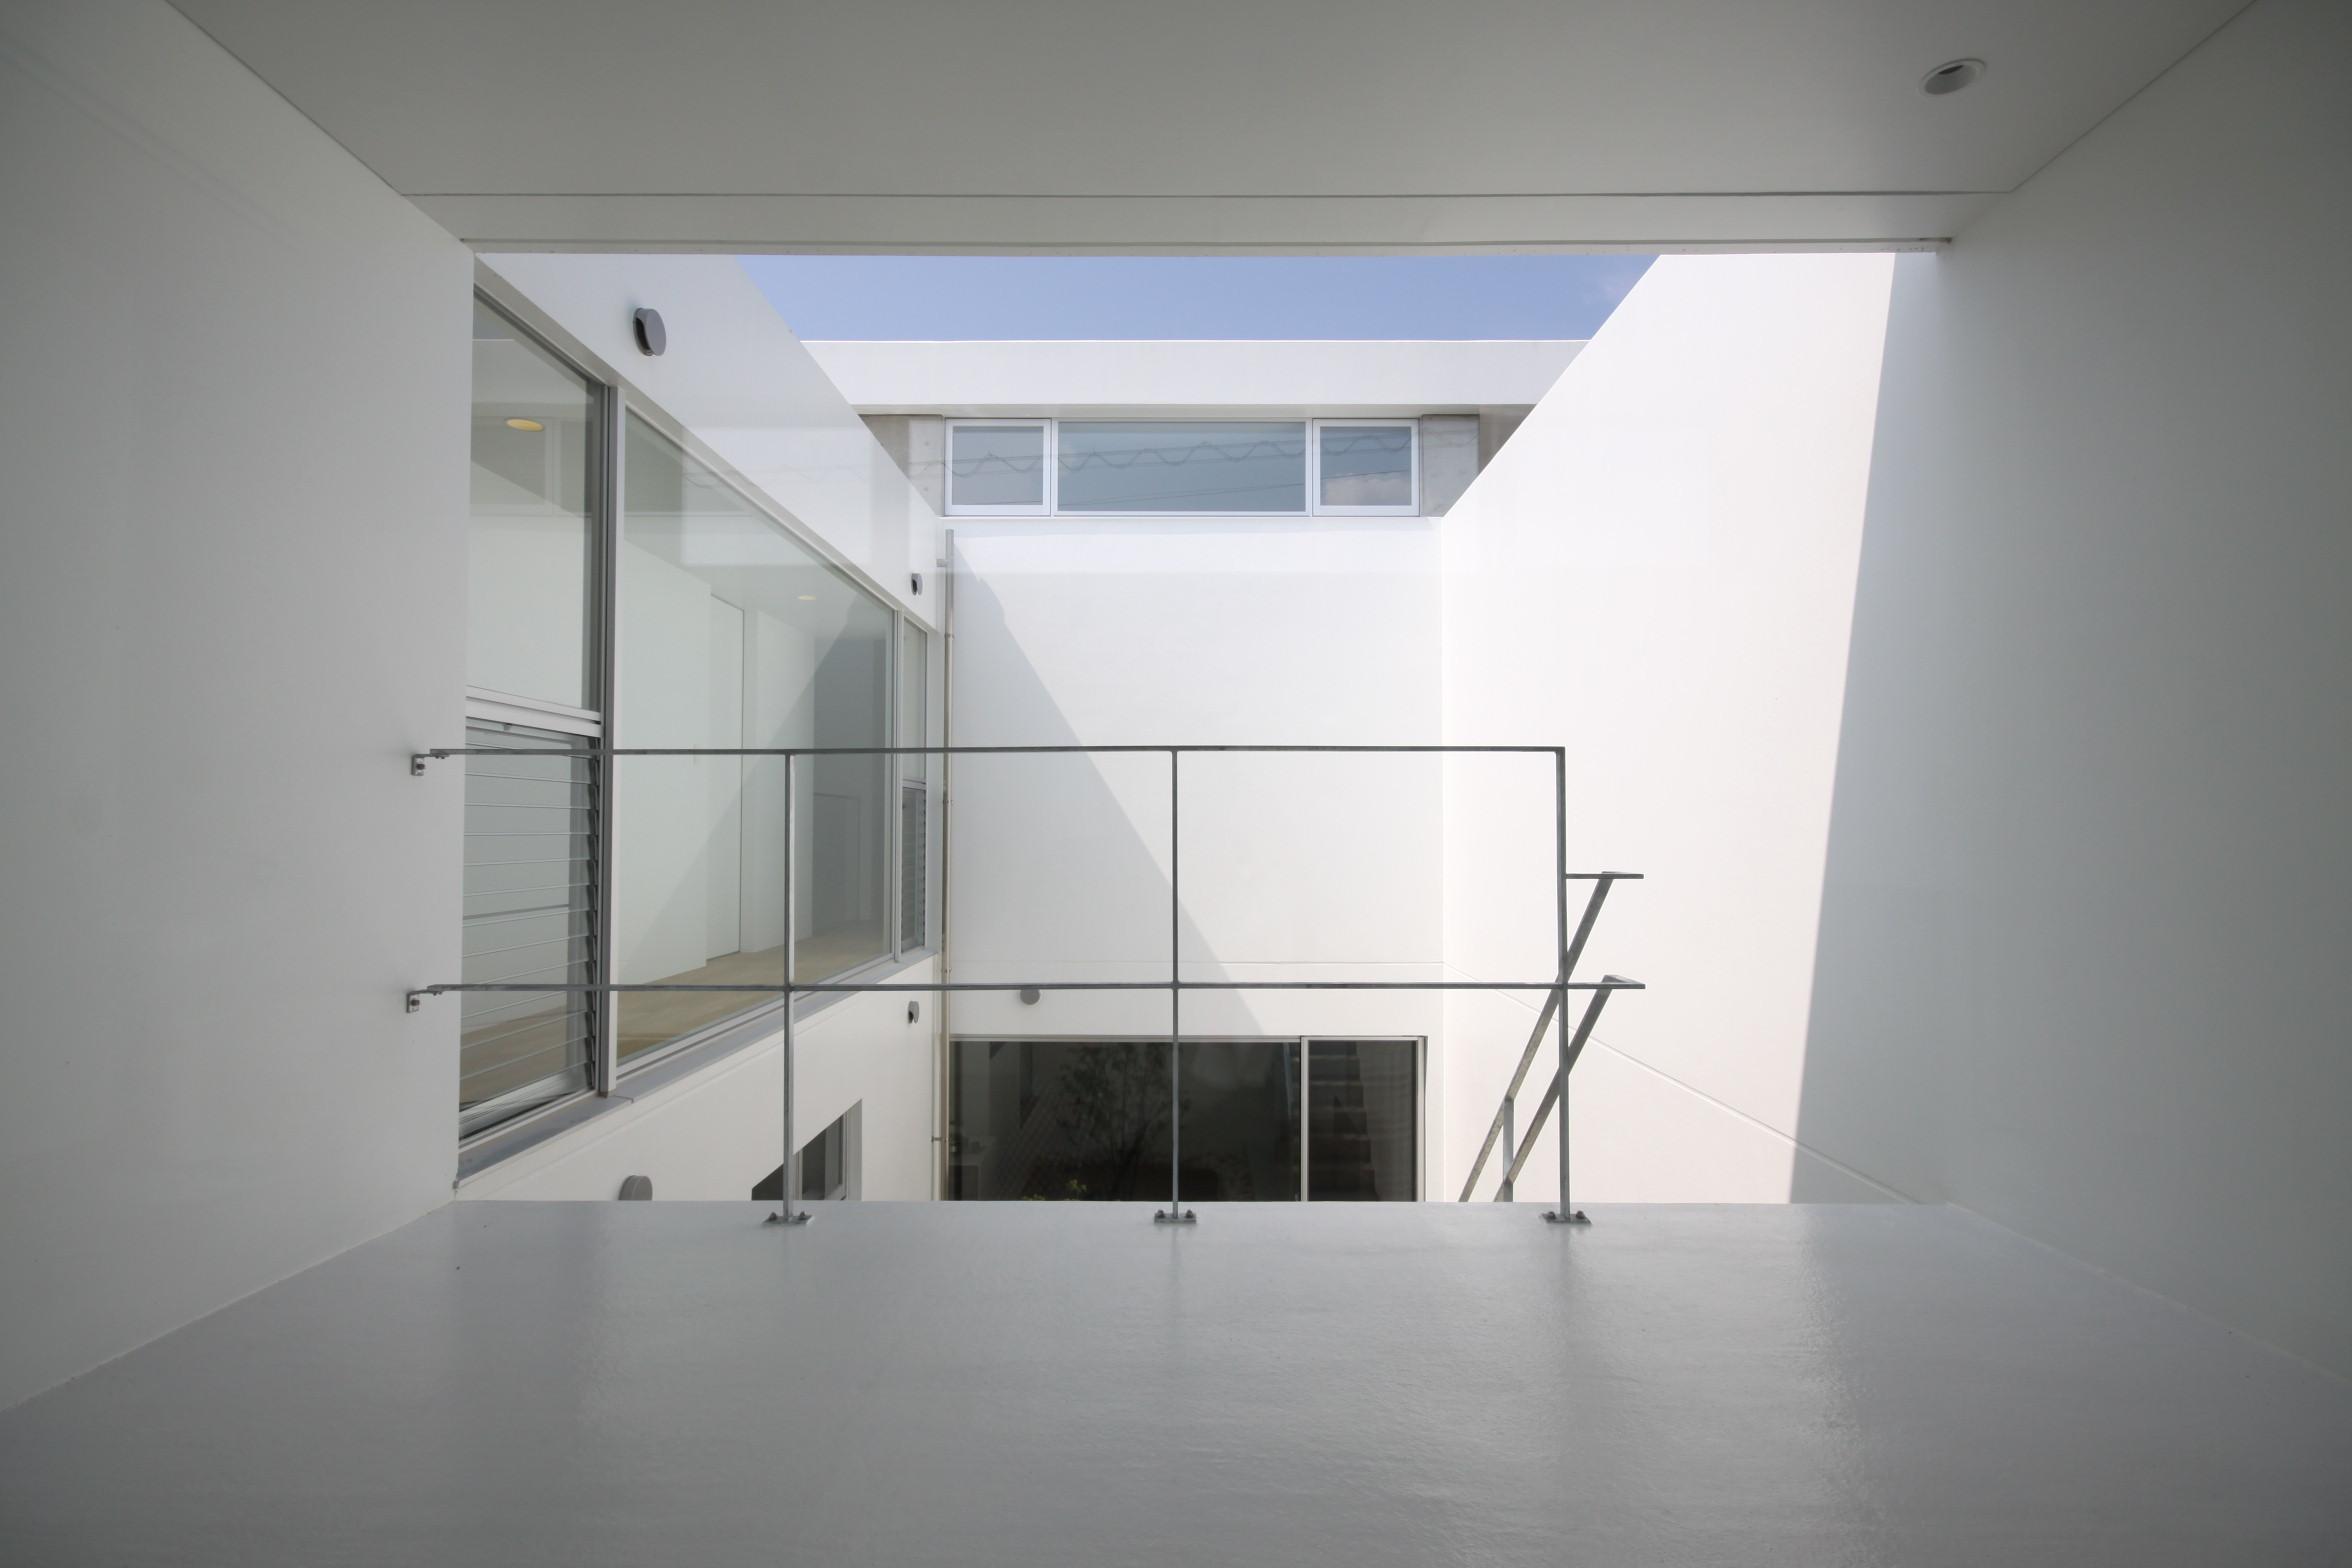 Tコートハウスの建築事例写真